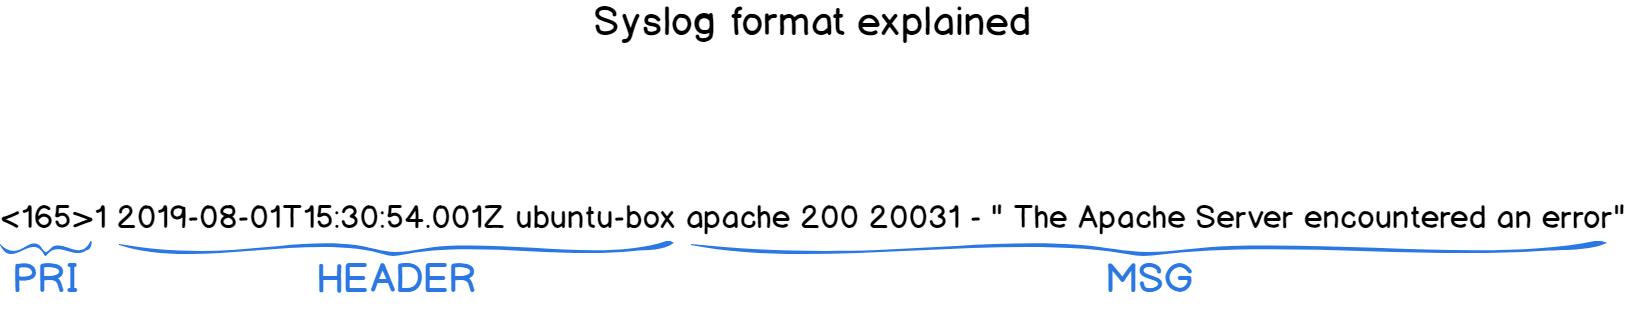 syslog-format